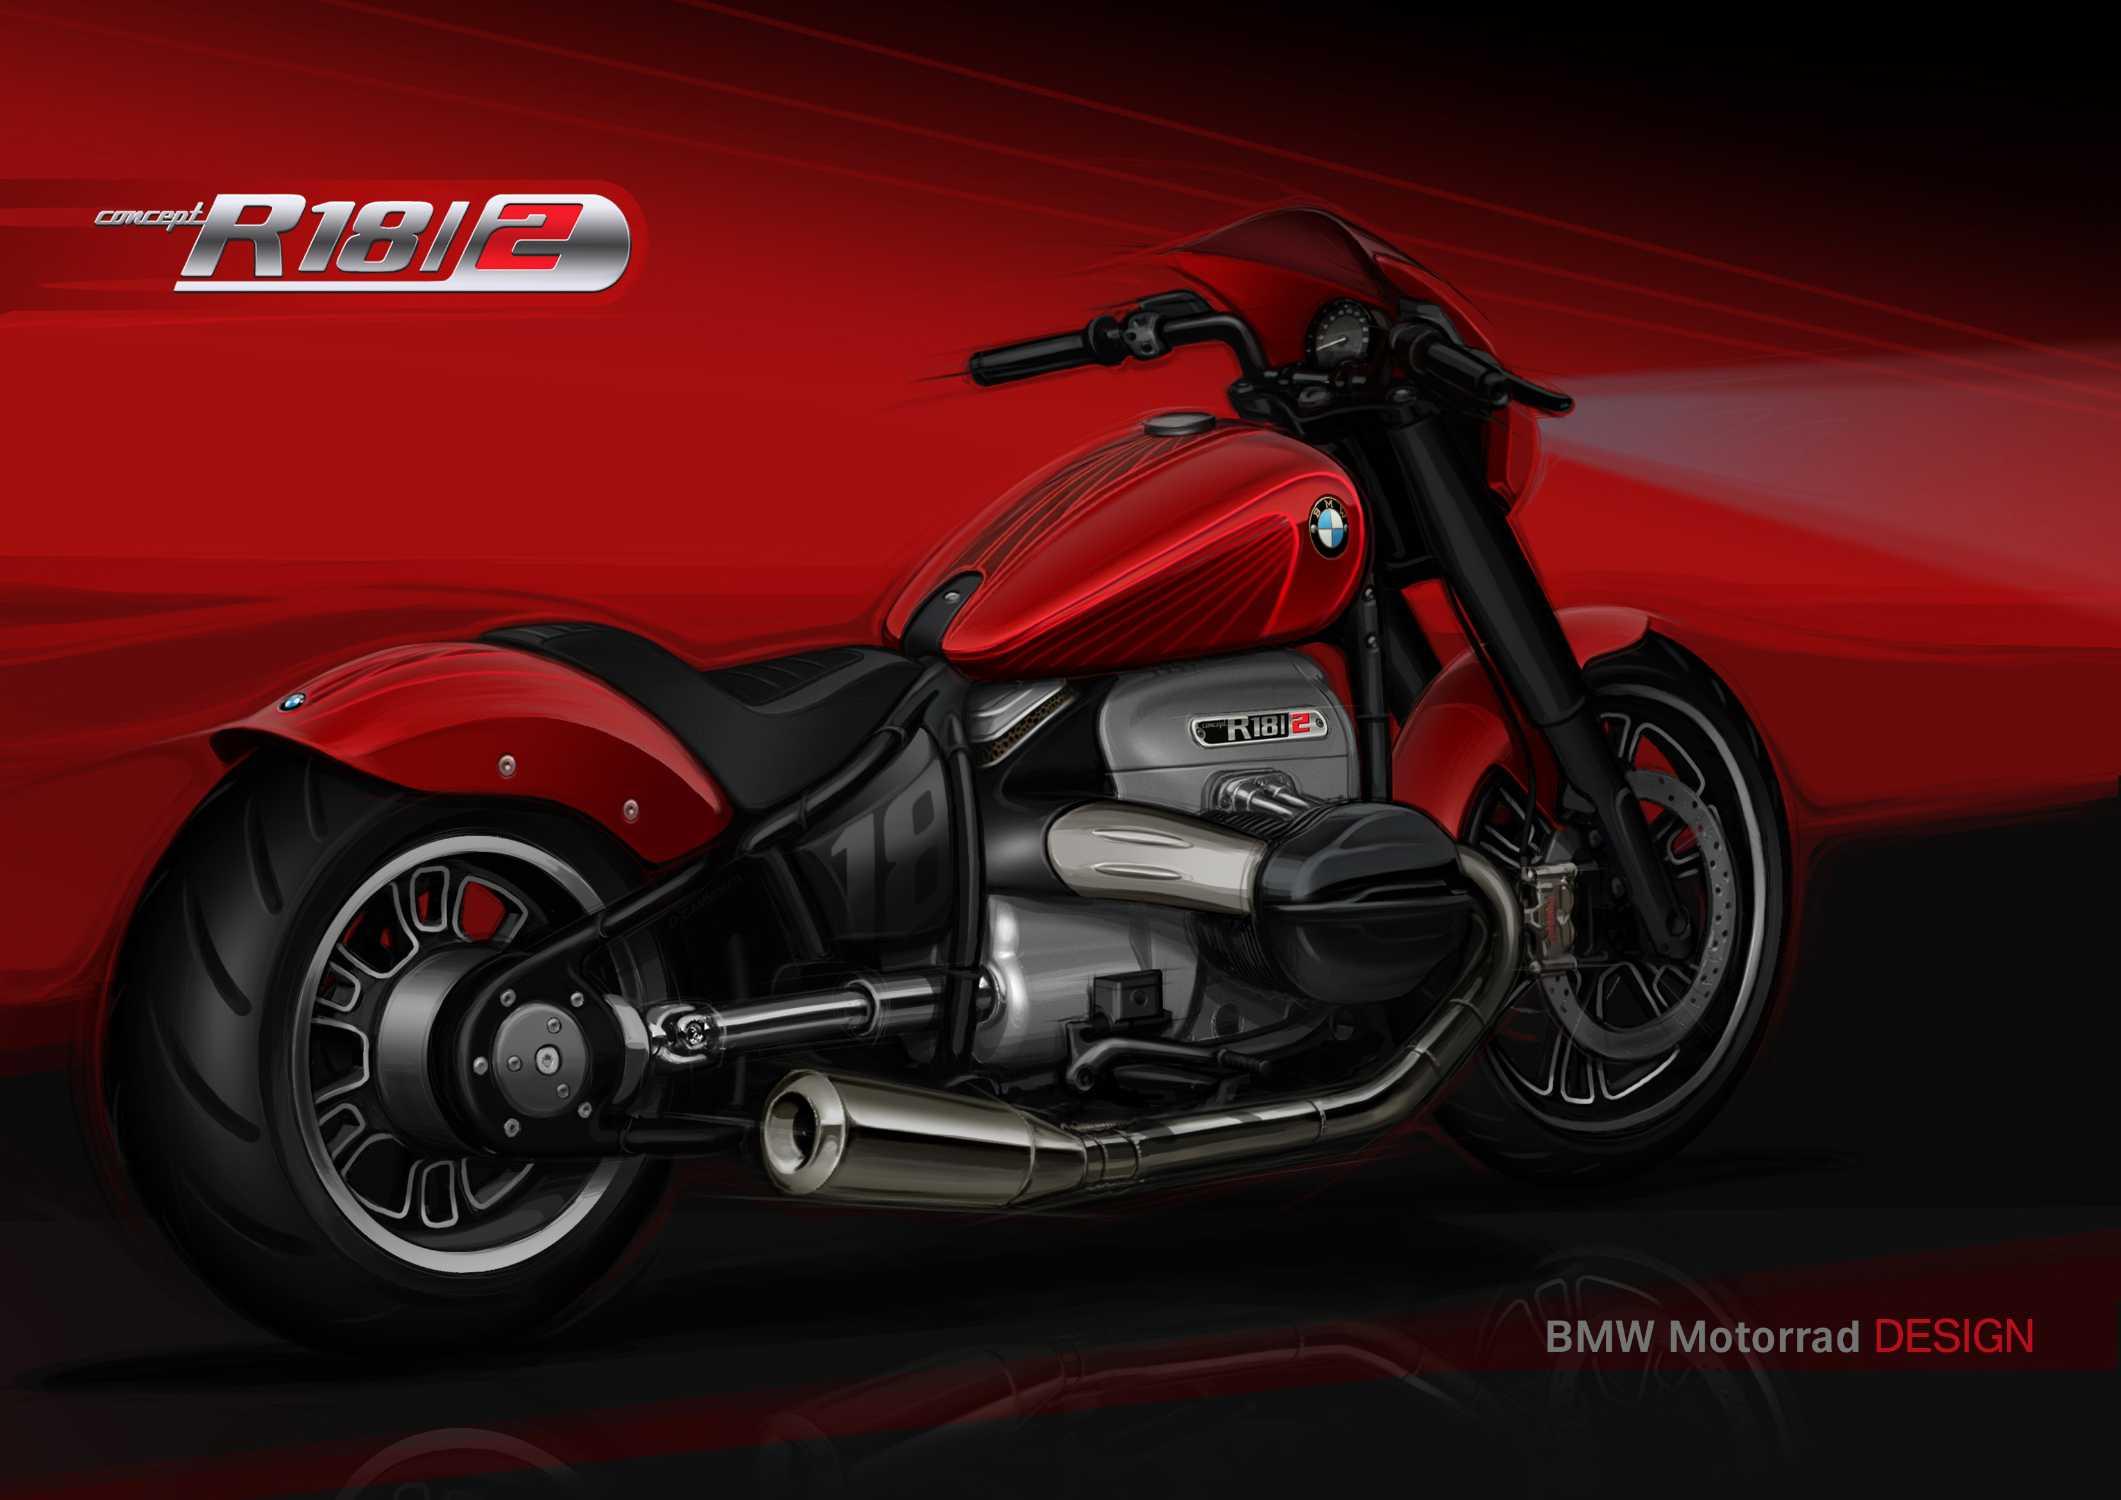 BMW Motorrad Concept R 18 /2. Design. (11/2019